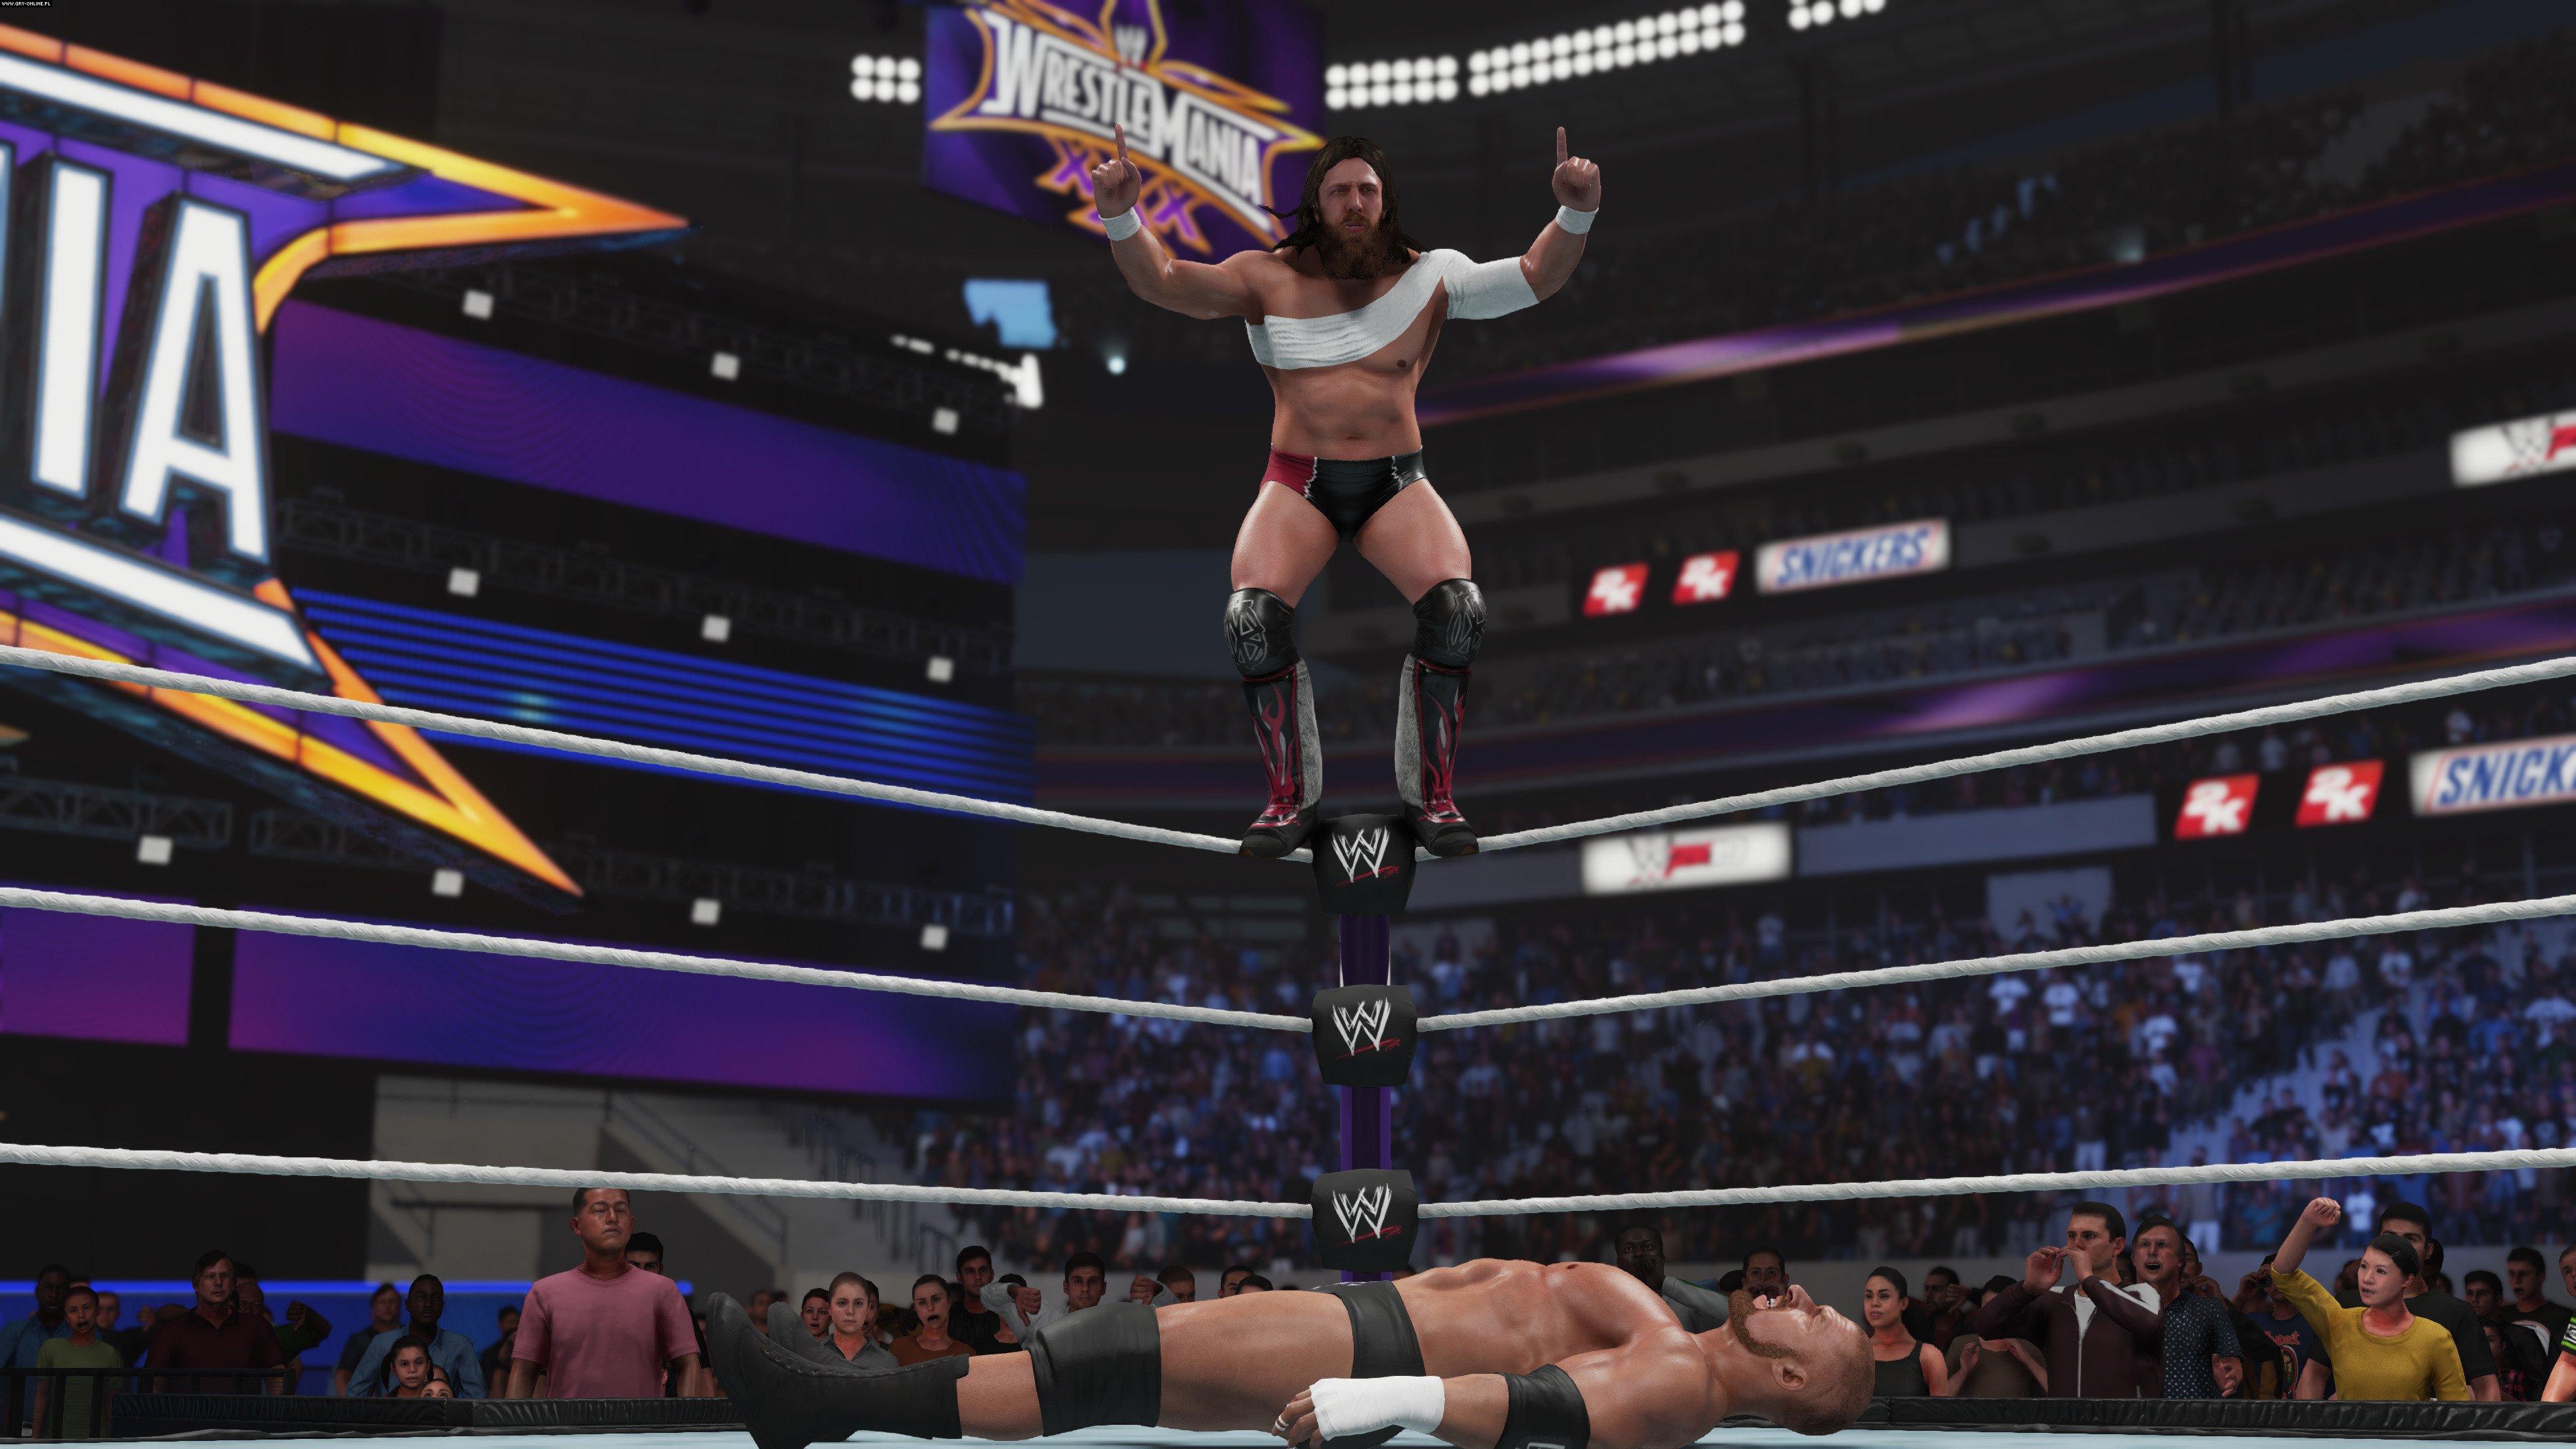 WWE 2K19 PC, PS4, XONE Games Image 5/8, Yuke's, 2K Games